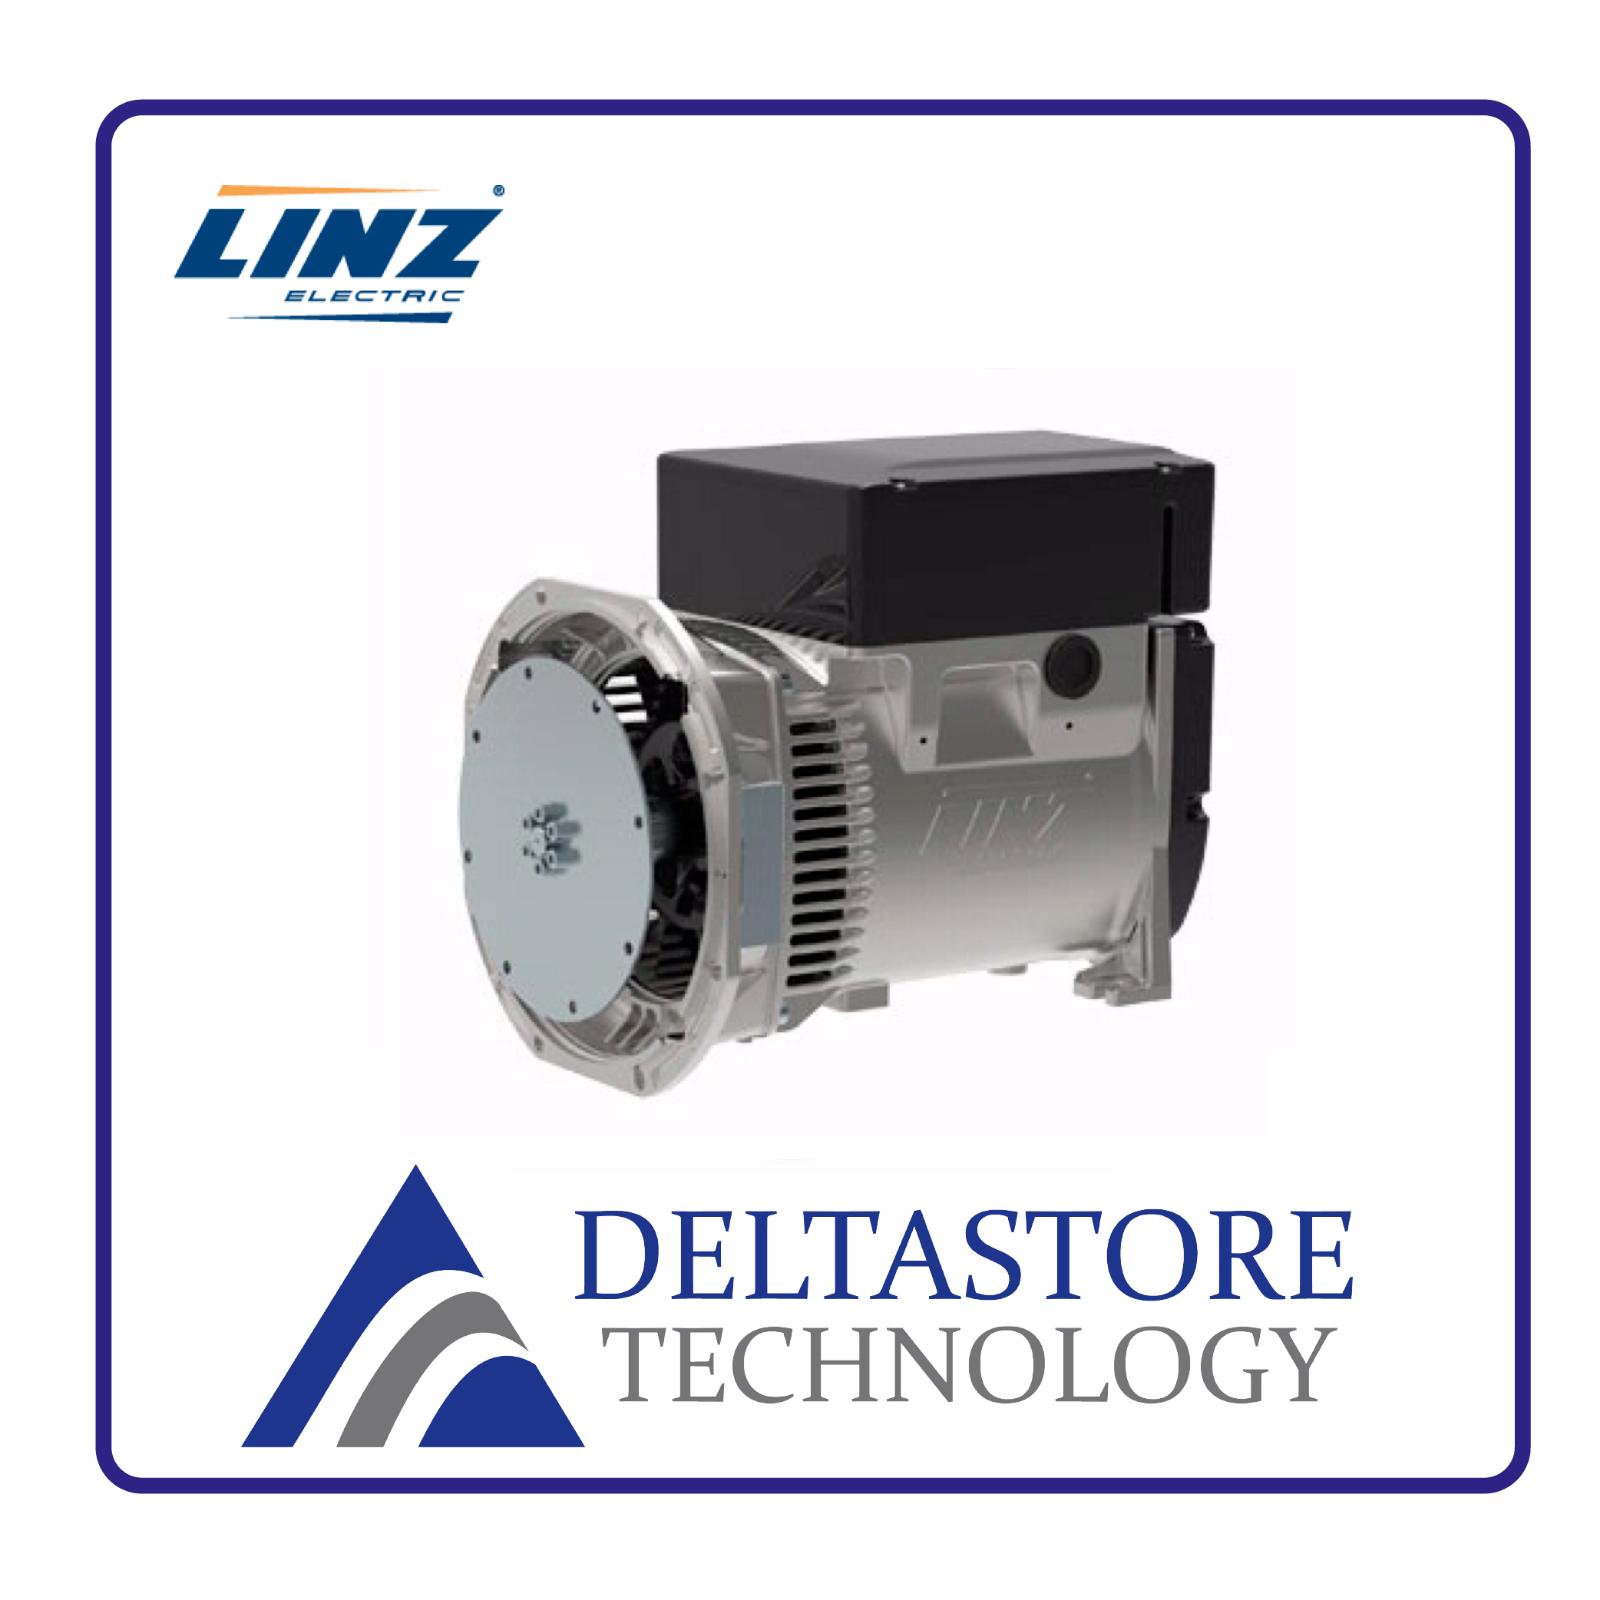 ALTERNATORE MONOFASE LINZ E1C13/4 DA 5.5 A 12.5 kVA 4 POLI 1500 FLANGIA A SCELTA